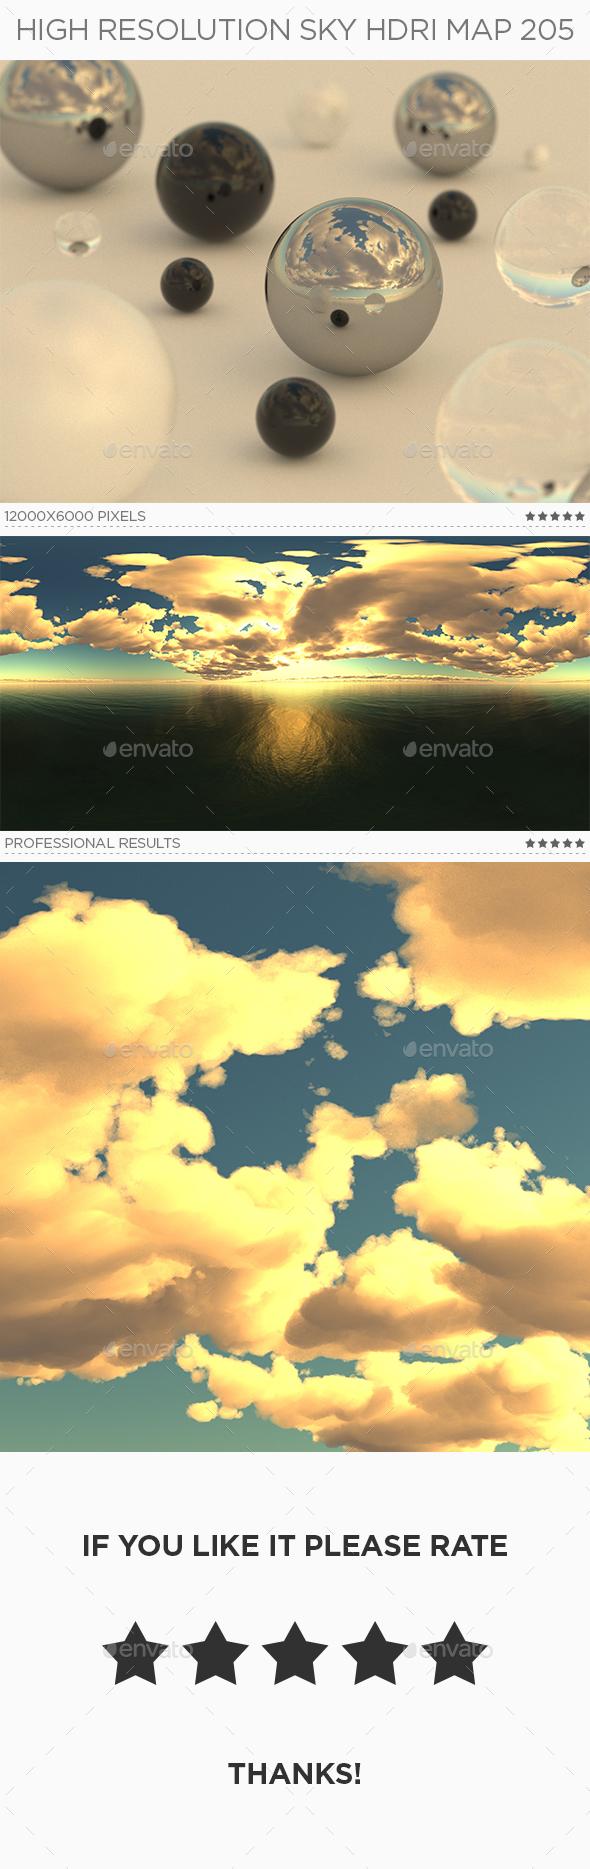 High Resolution Sky HDRi Map 205 - 3DOcean Item for Sale